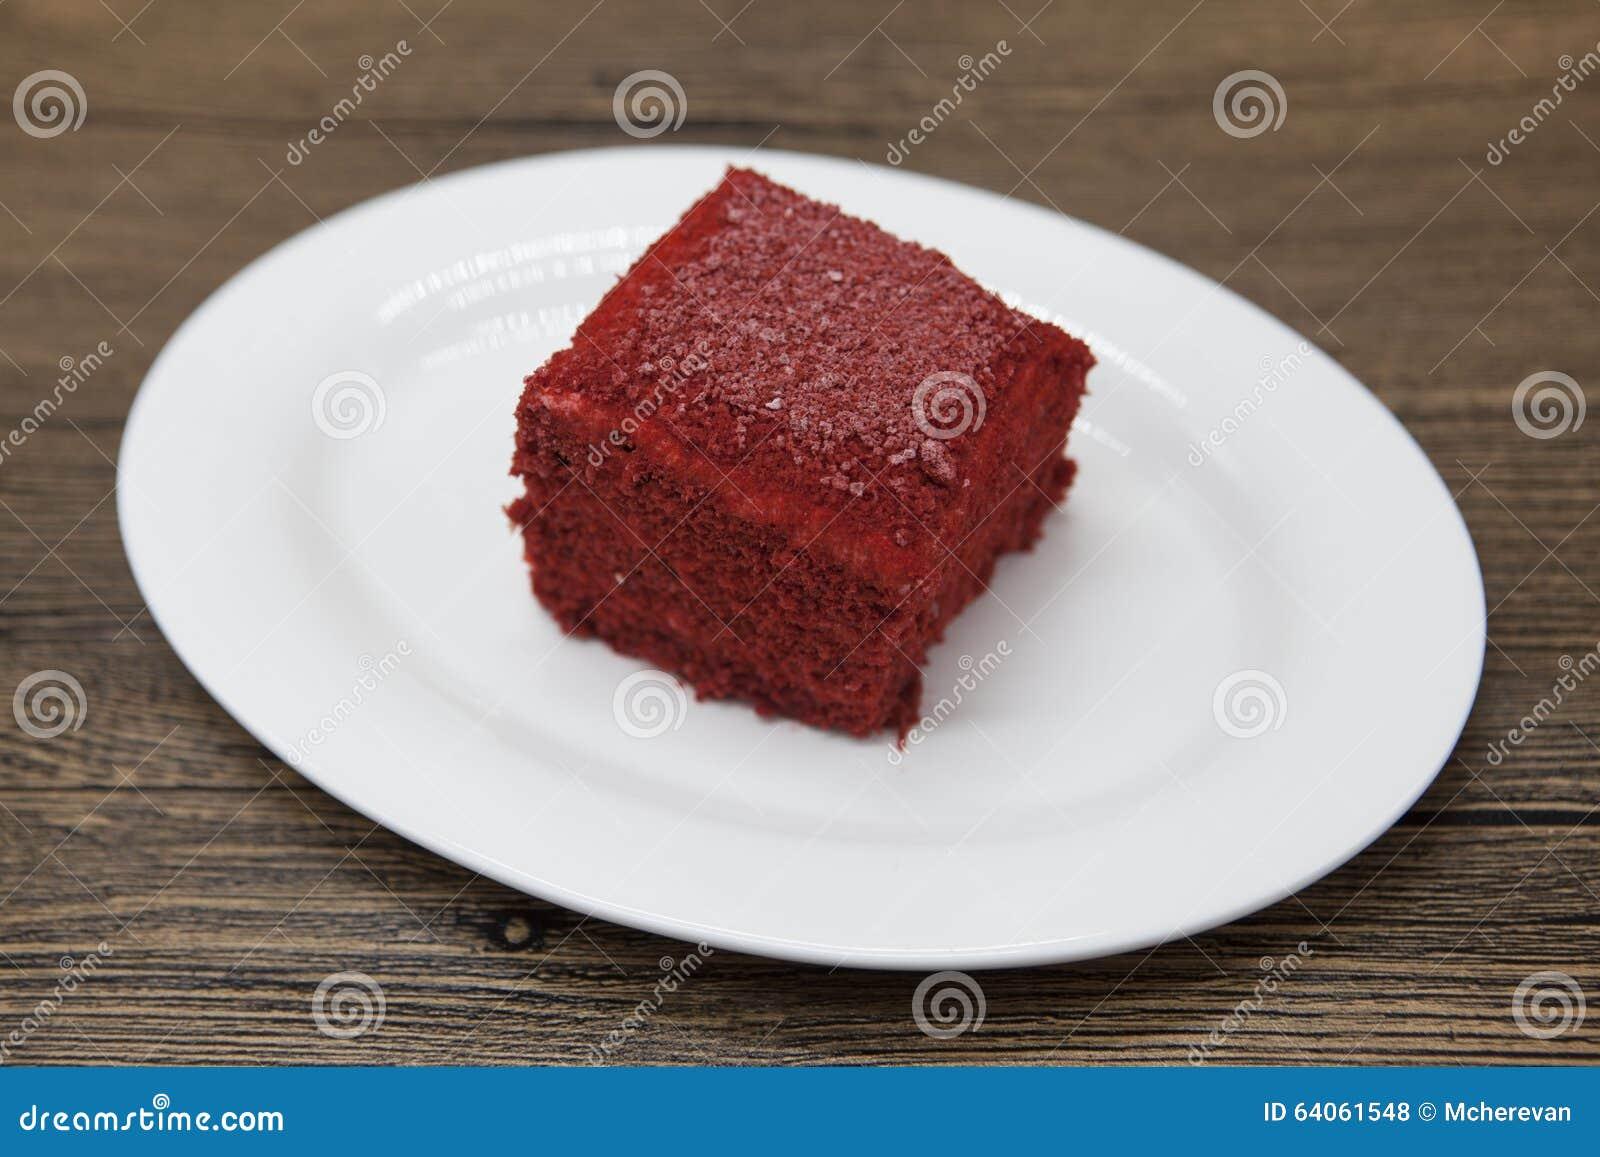 Healthy Low Calorie Red Velvet Cake